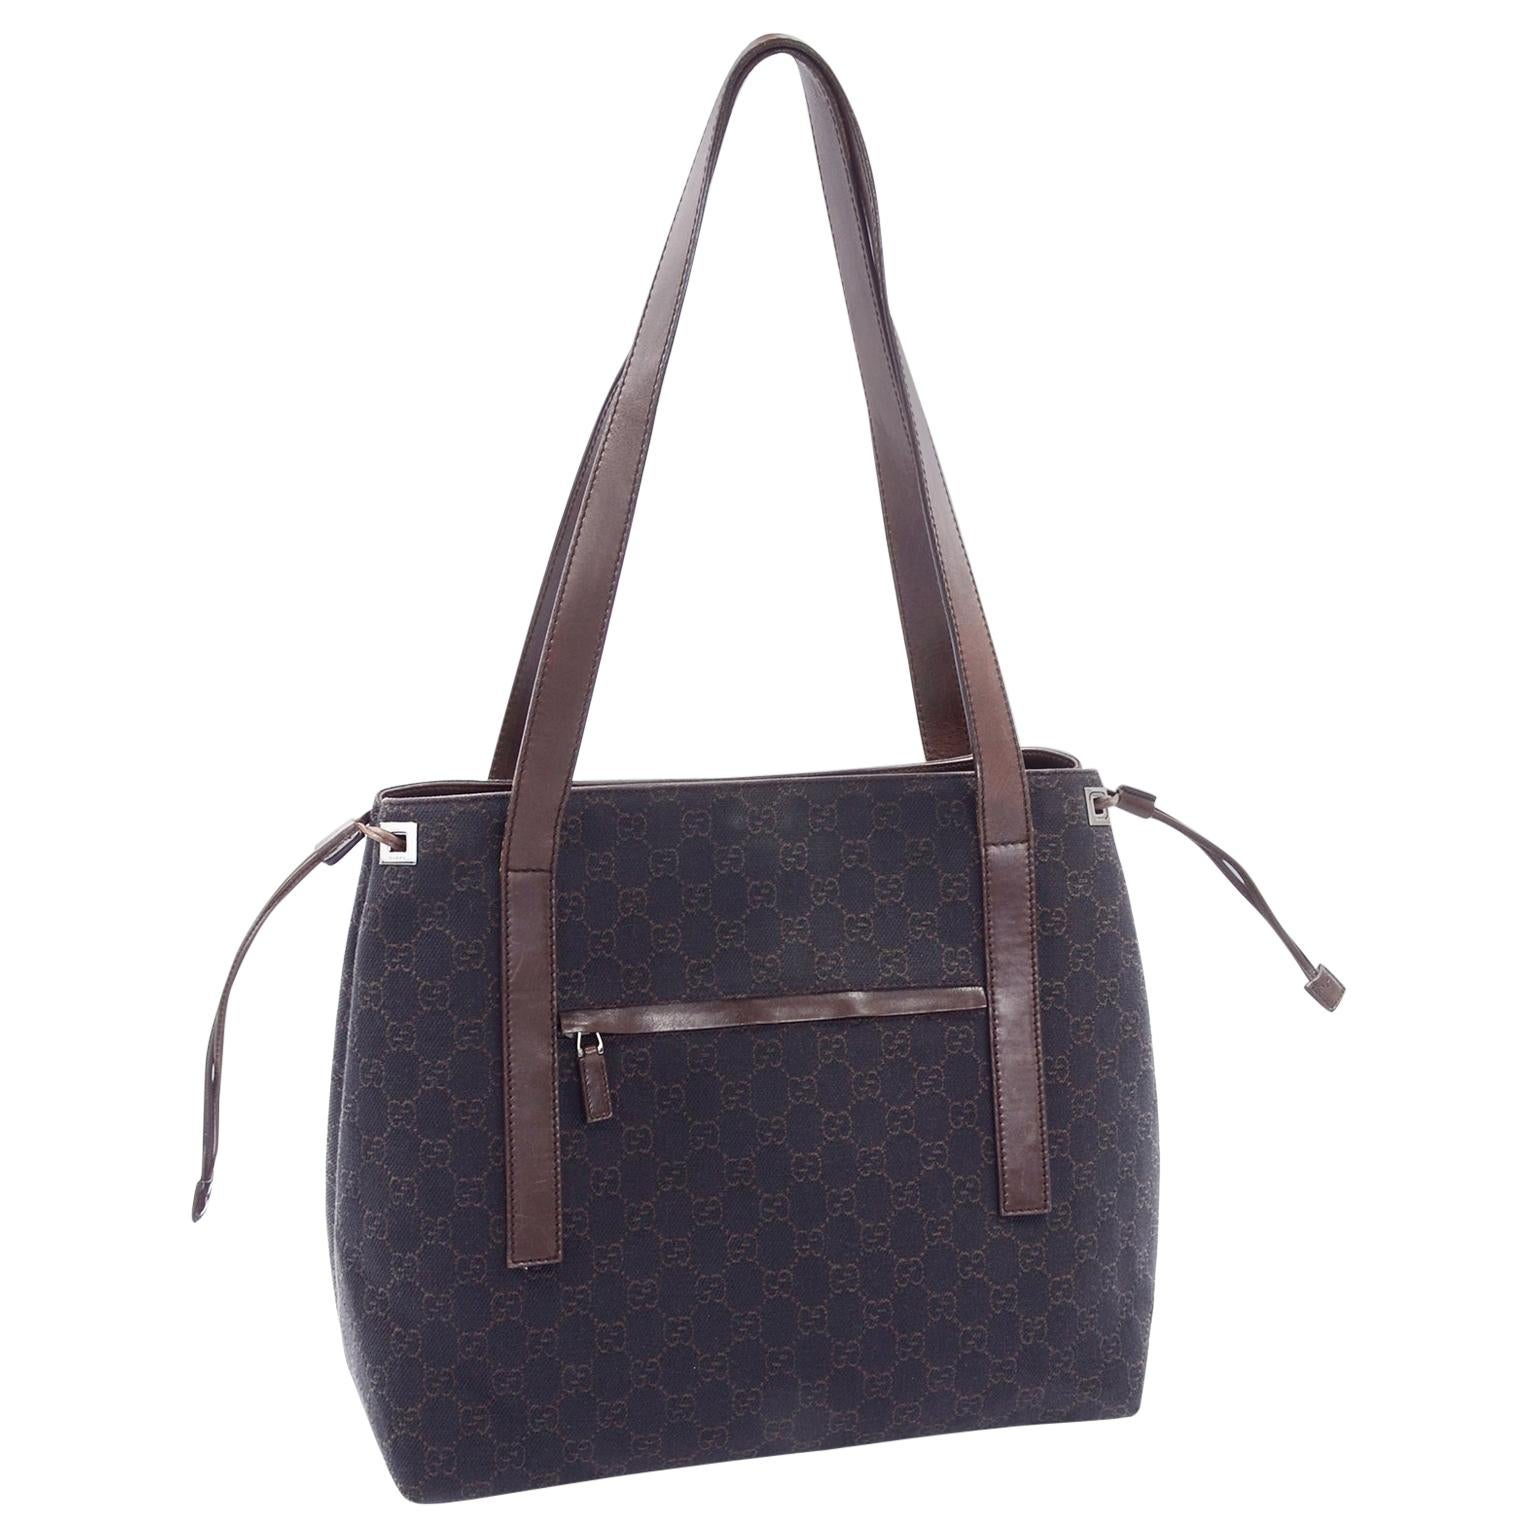 Medium Gucci Brown Monogram Canvas & Leather Tote Bag Handbag